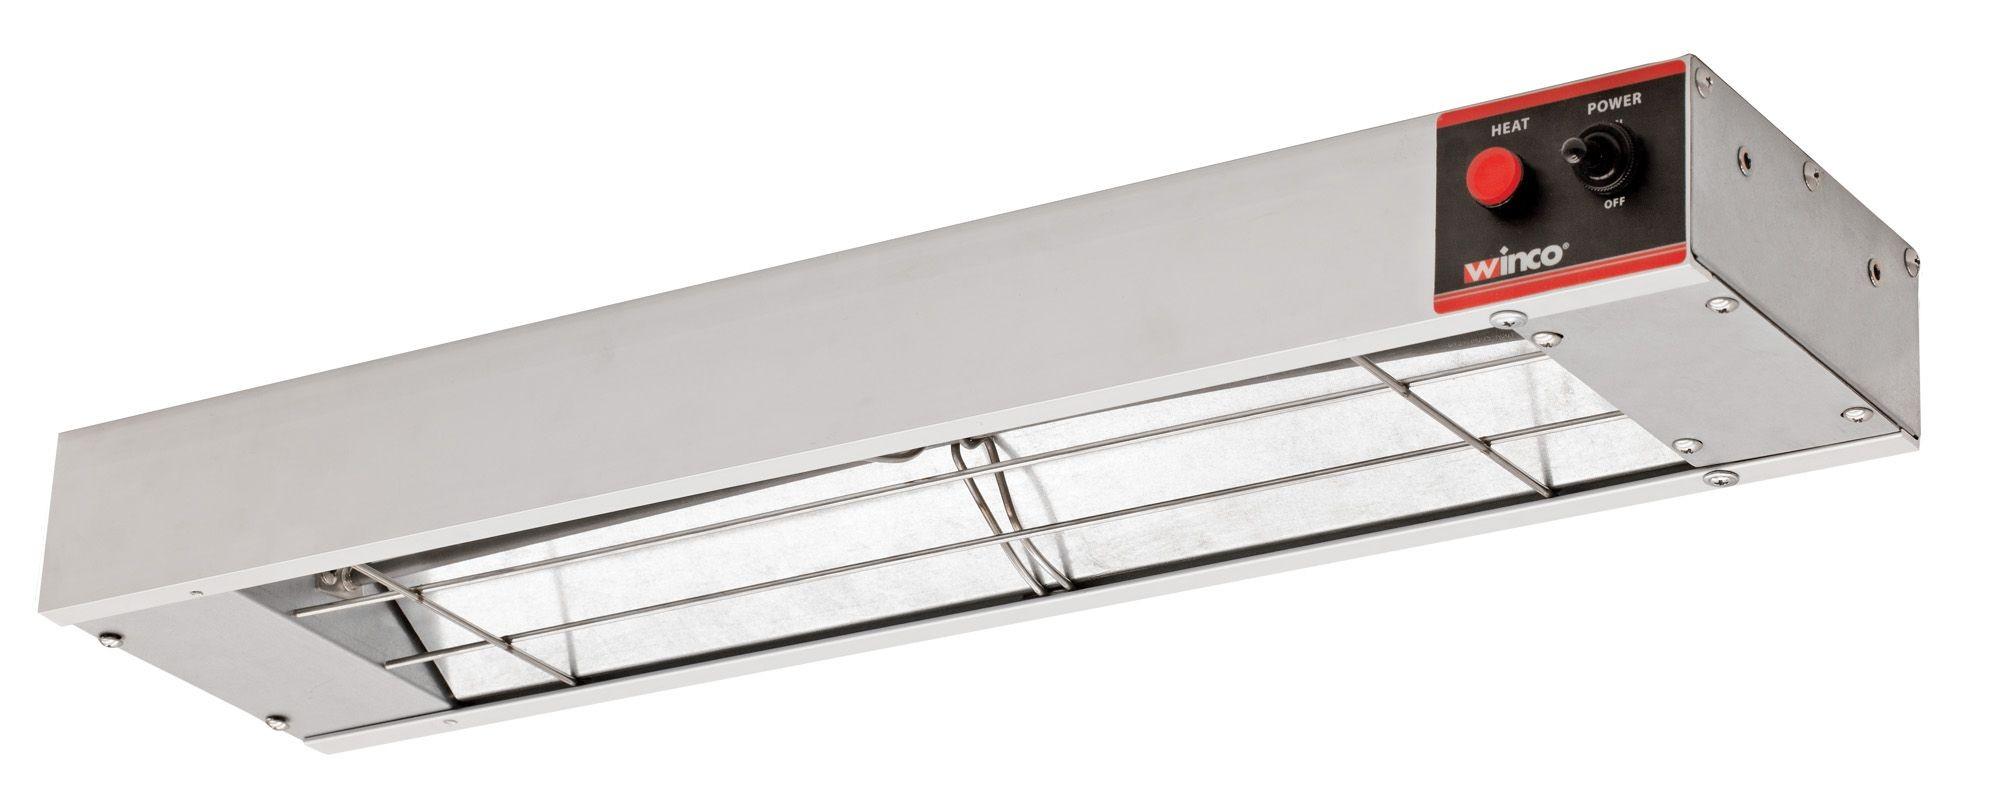 "Winco ESH-24 24"" Electric Infrared Strip Heater"